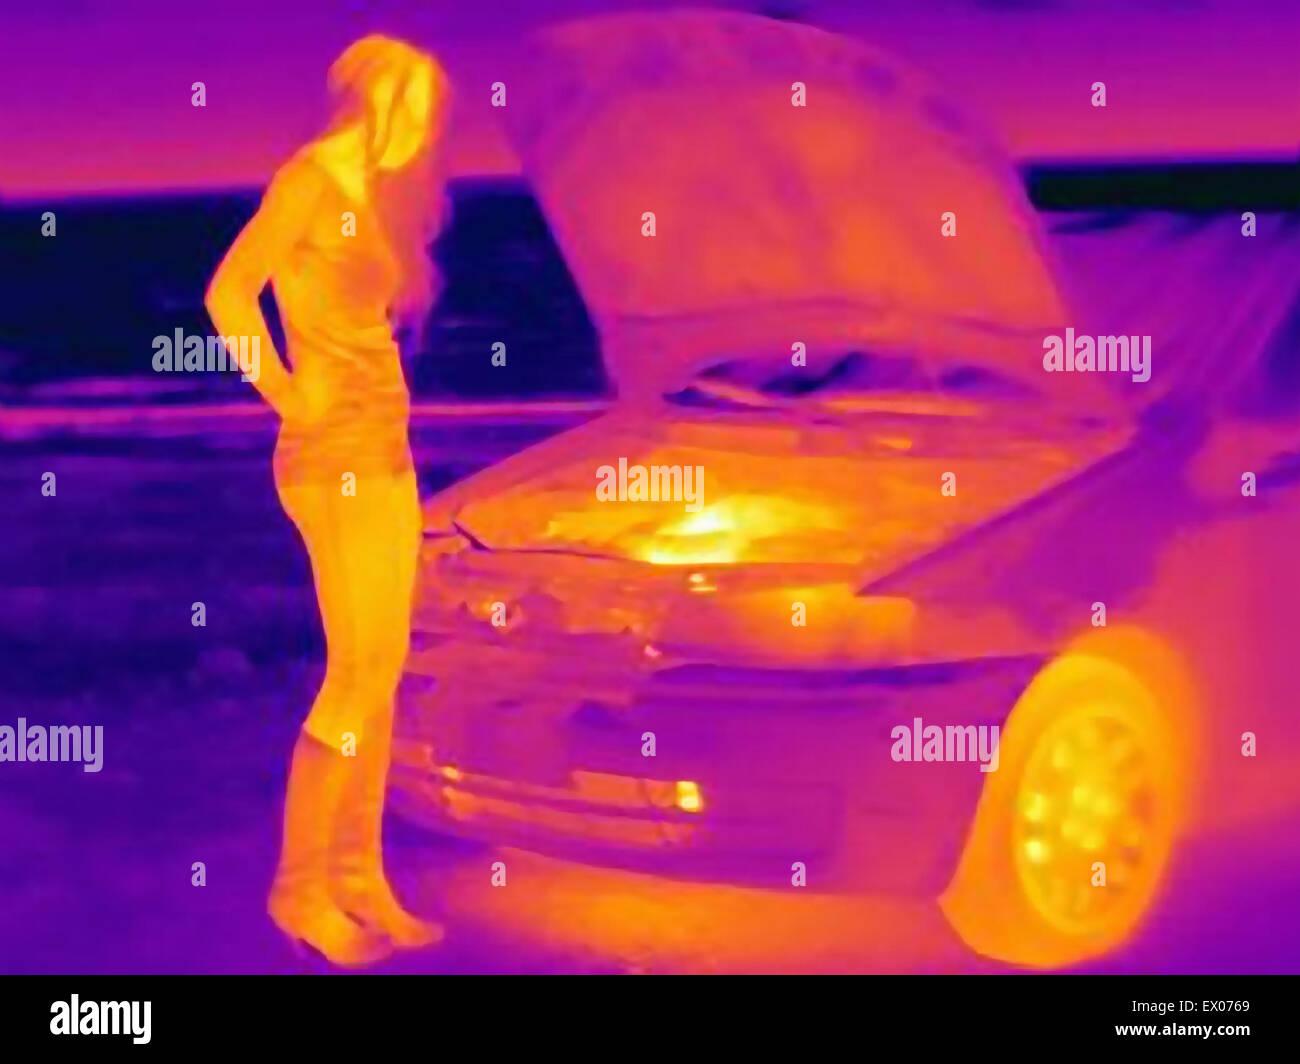 Wärmebild der Frau betrachten Automotor am Straßenrand Stockfoto ...